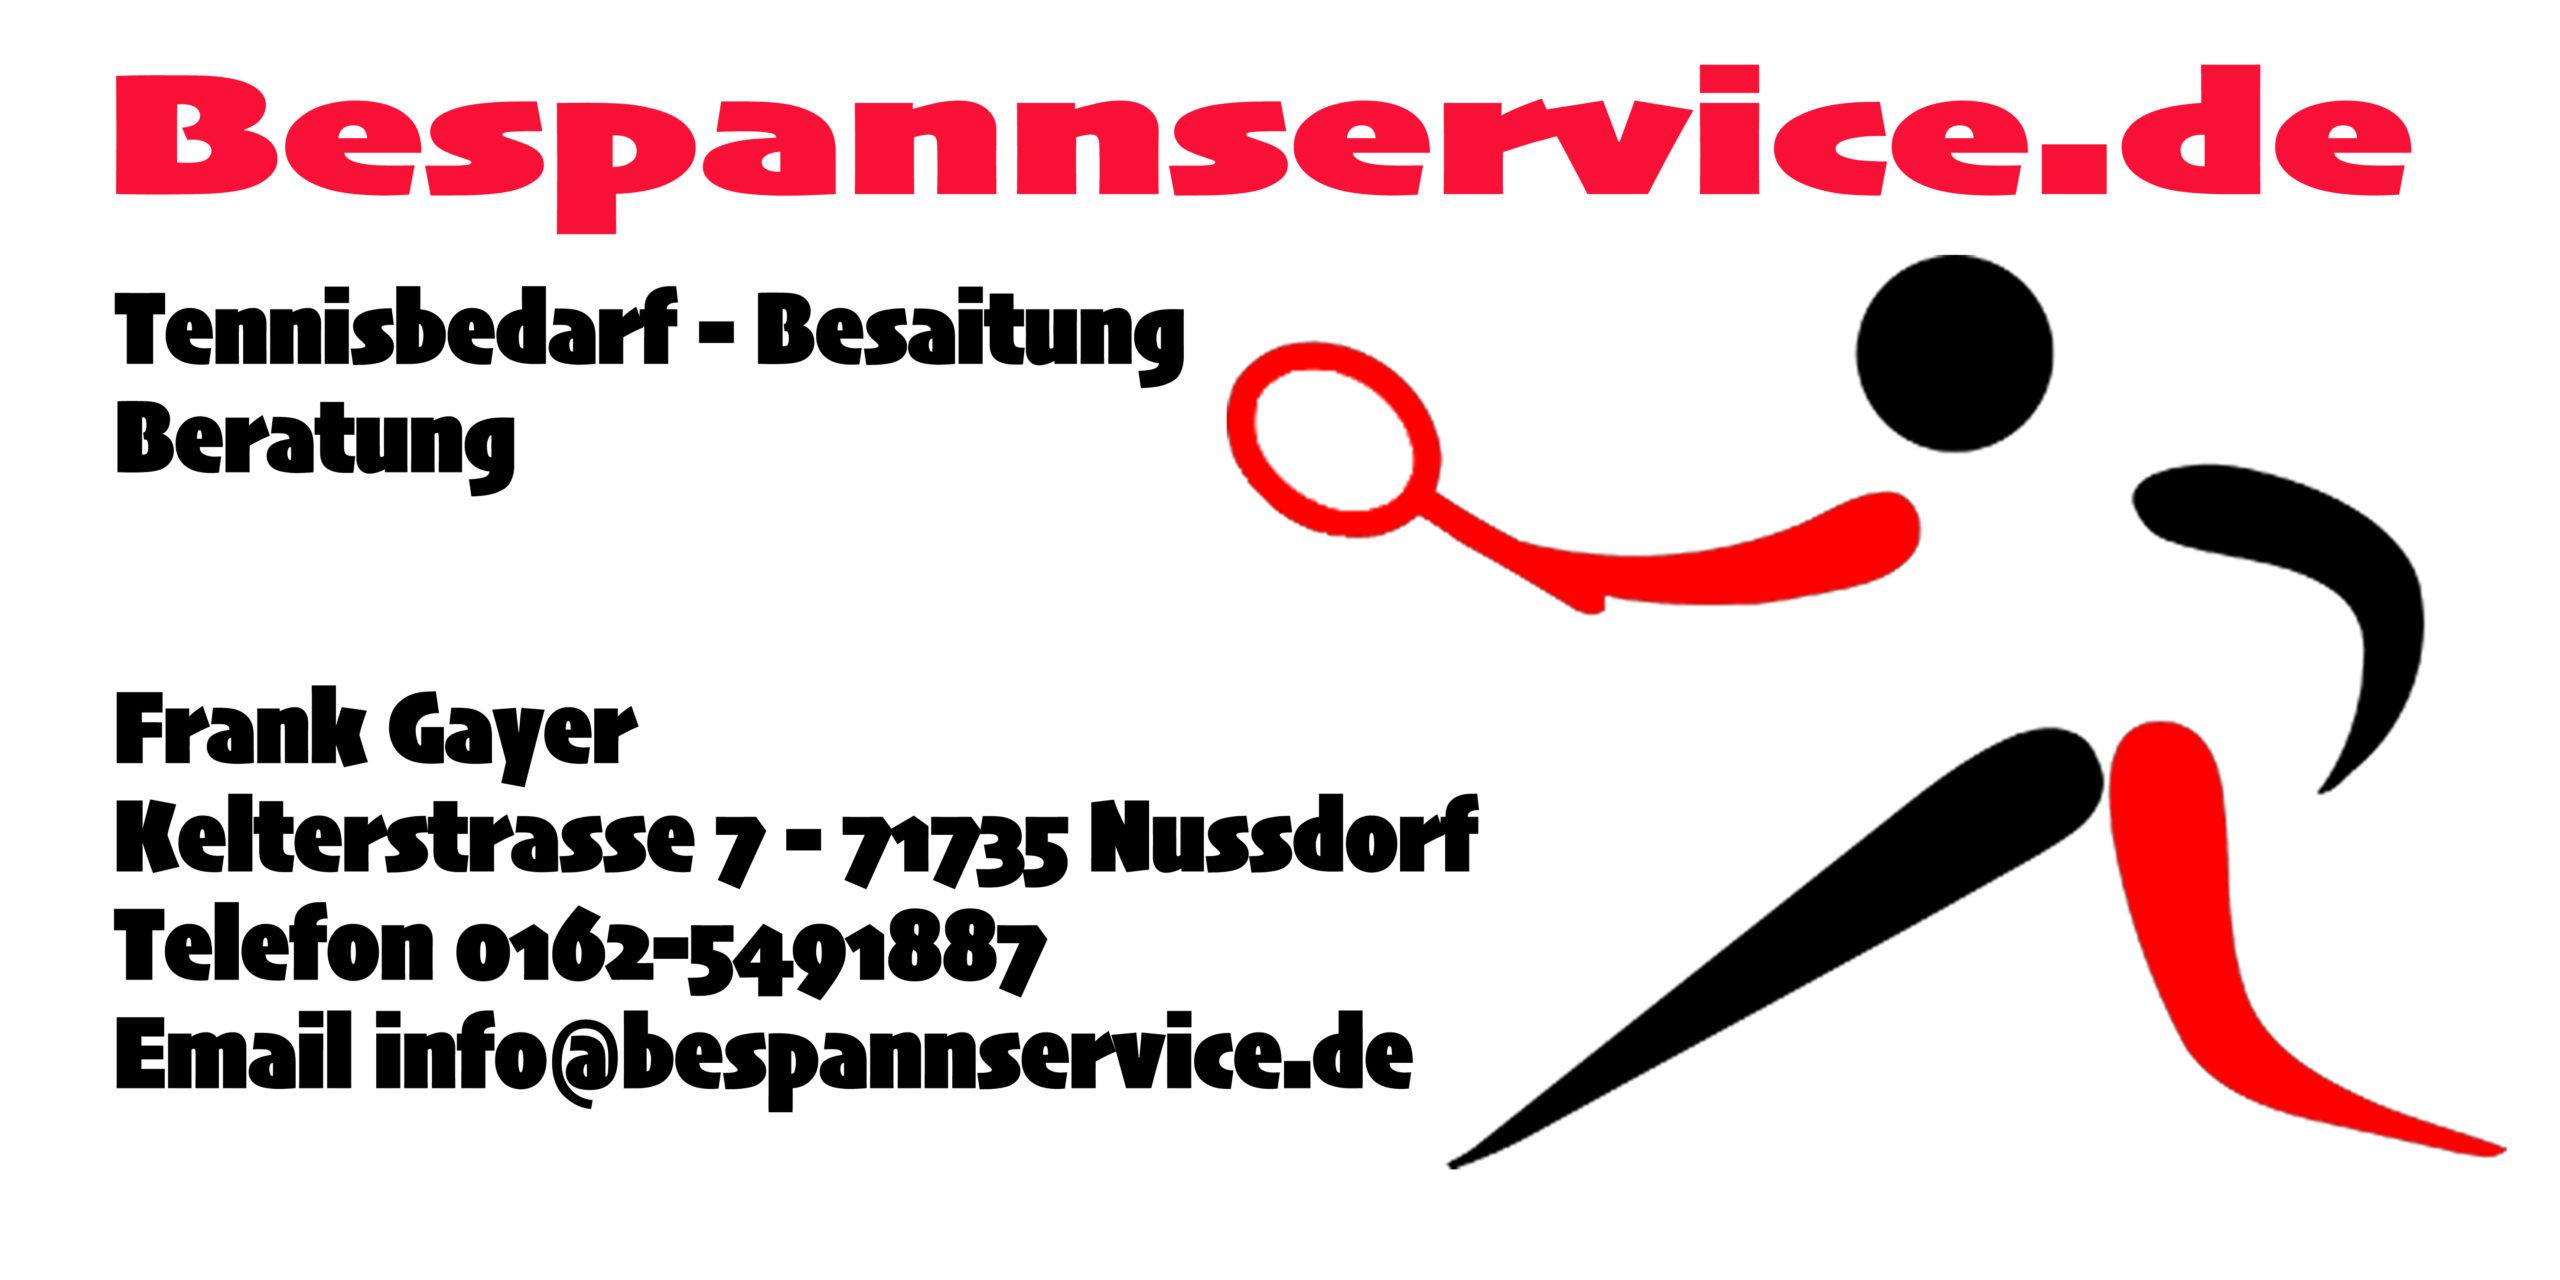 Willkommen bei Bespannservice.de